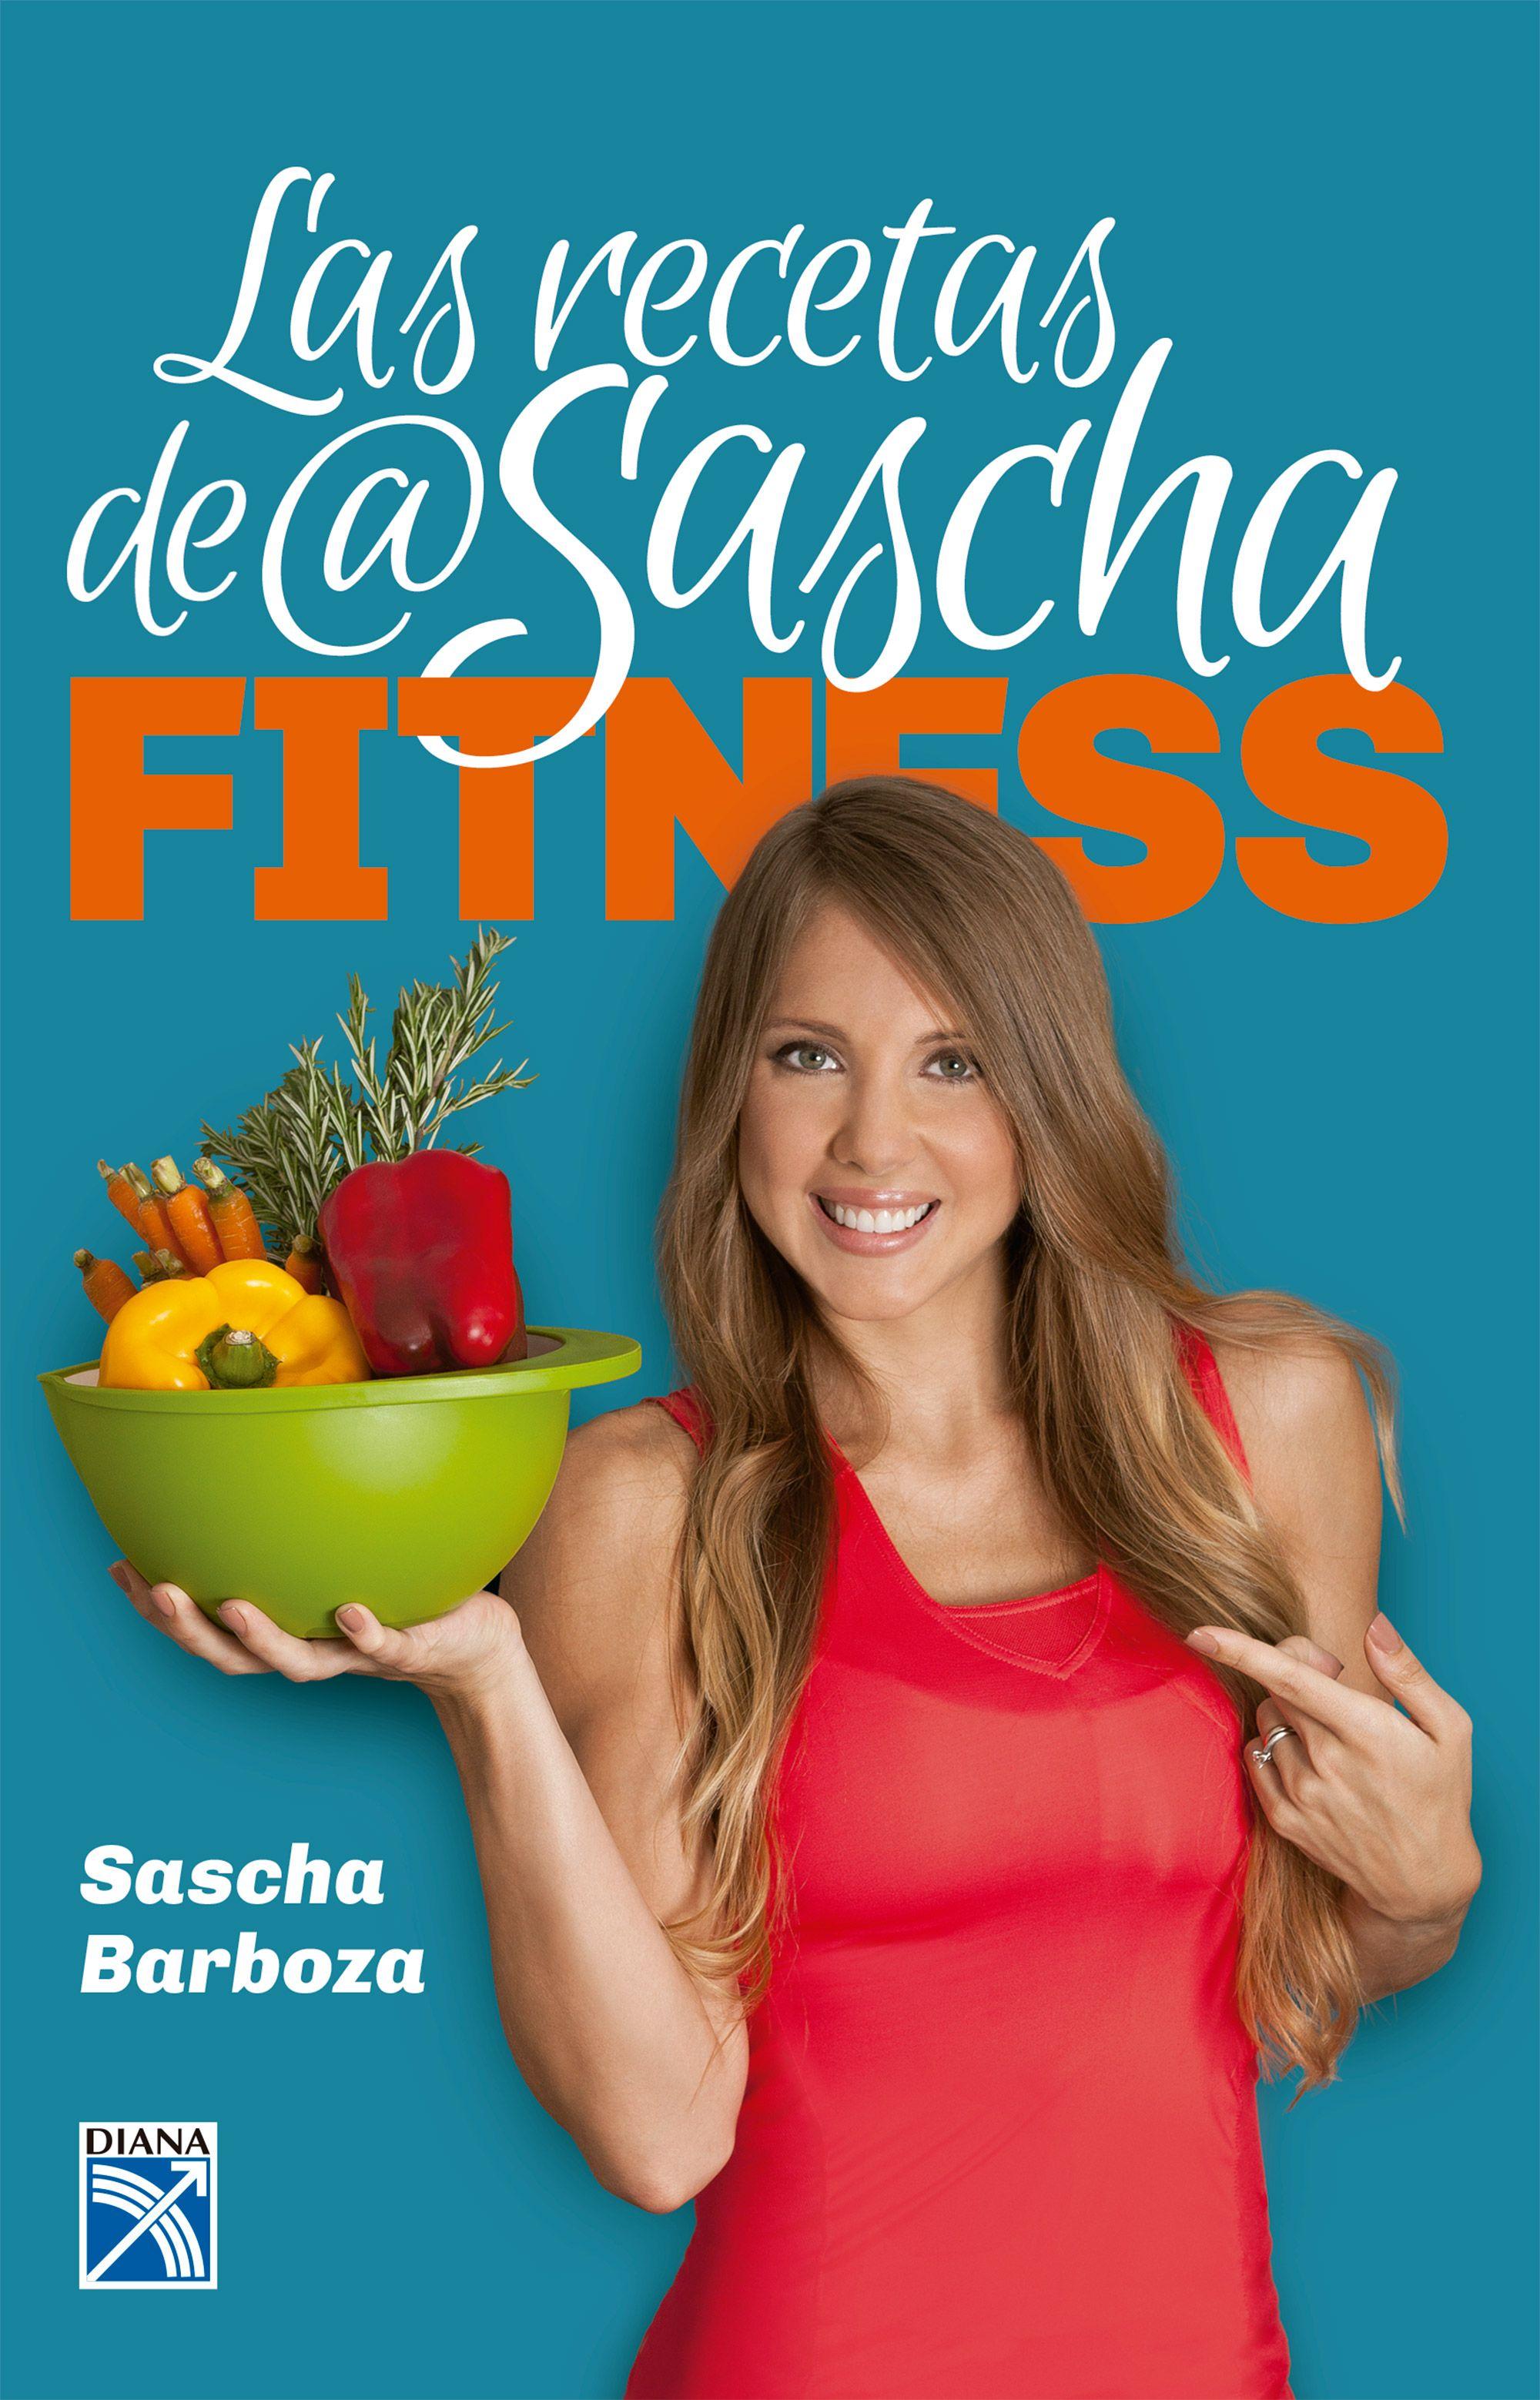 Las Recetas de @Saschafitness - Sascha Barboza - Diana